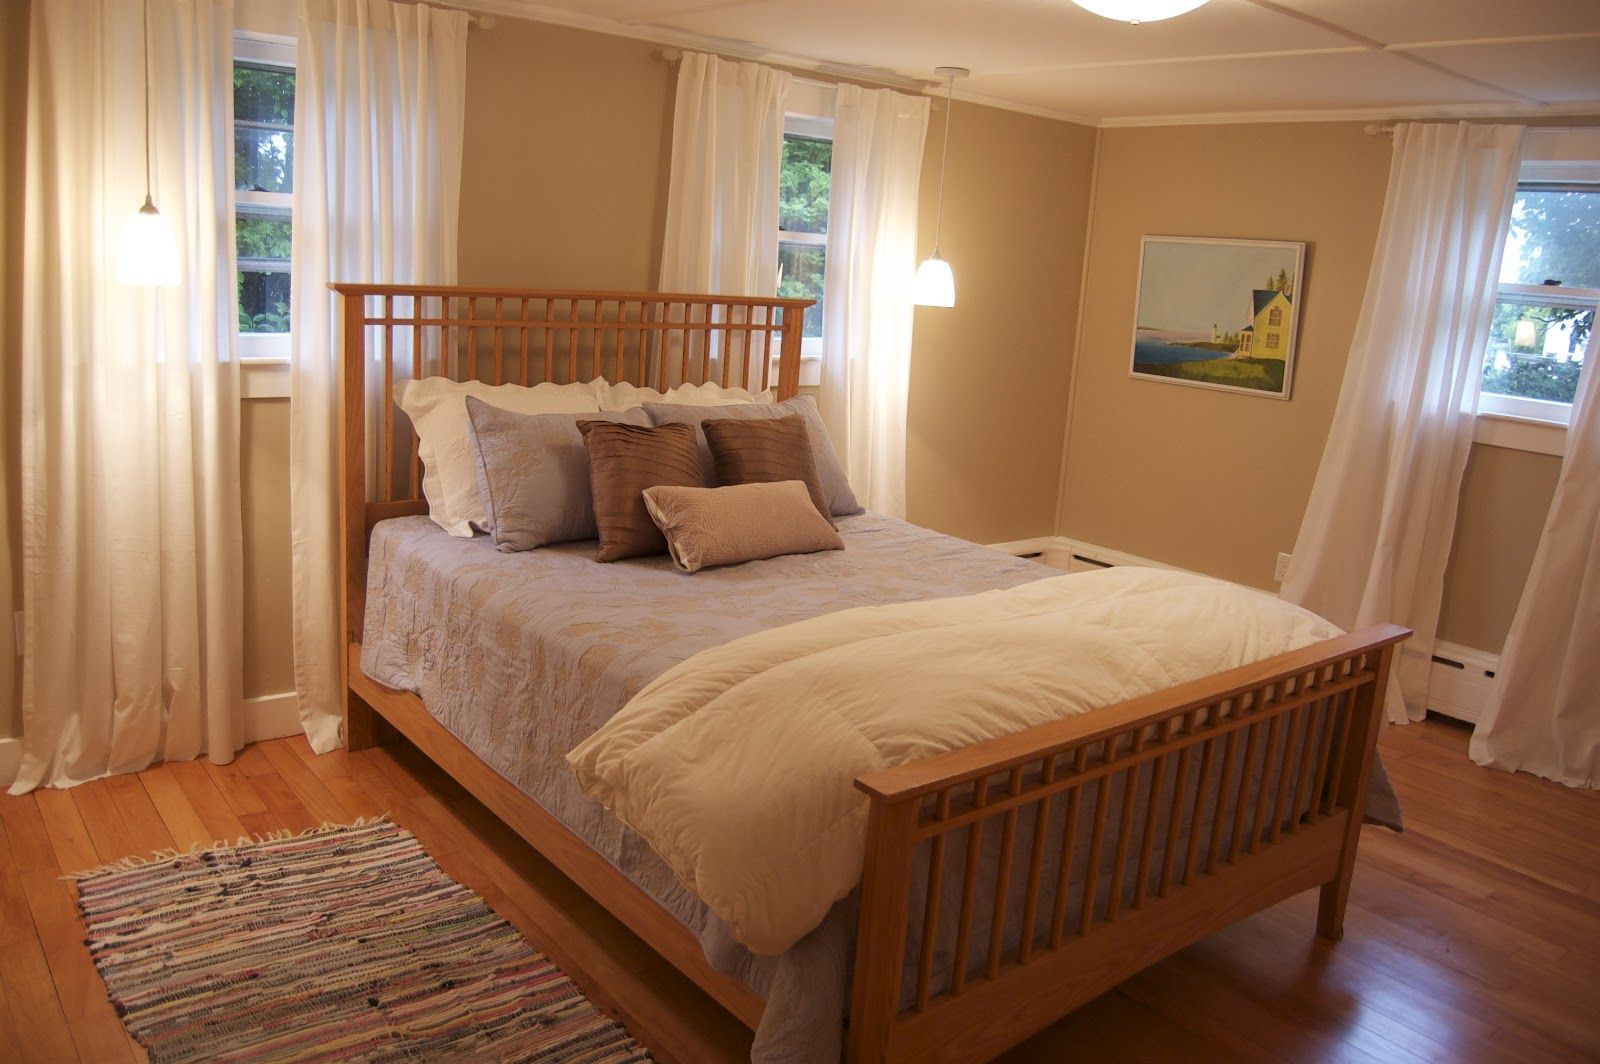 7 Ft Ceilings Long Drapes Bedroom Makeover Master Bedroom Makeover Cottage Bedroom